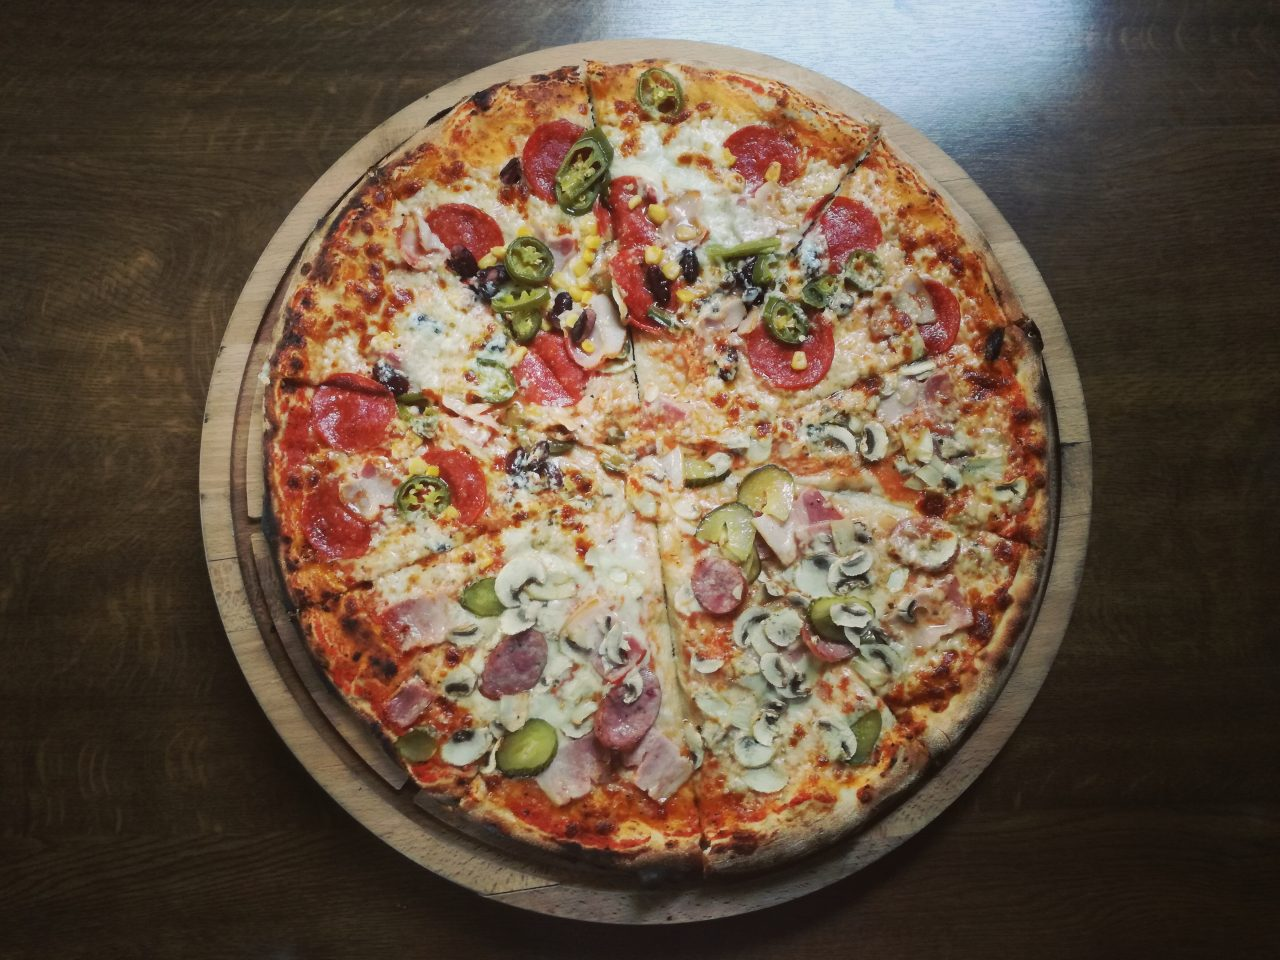 socker i pizza